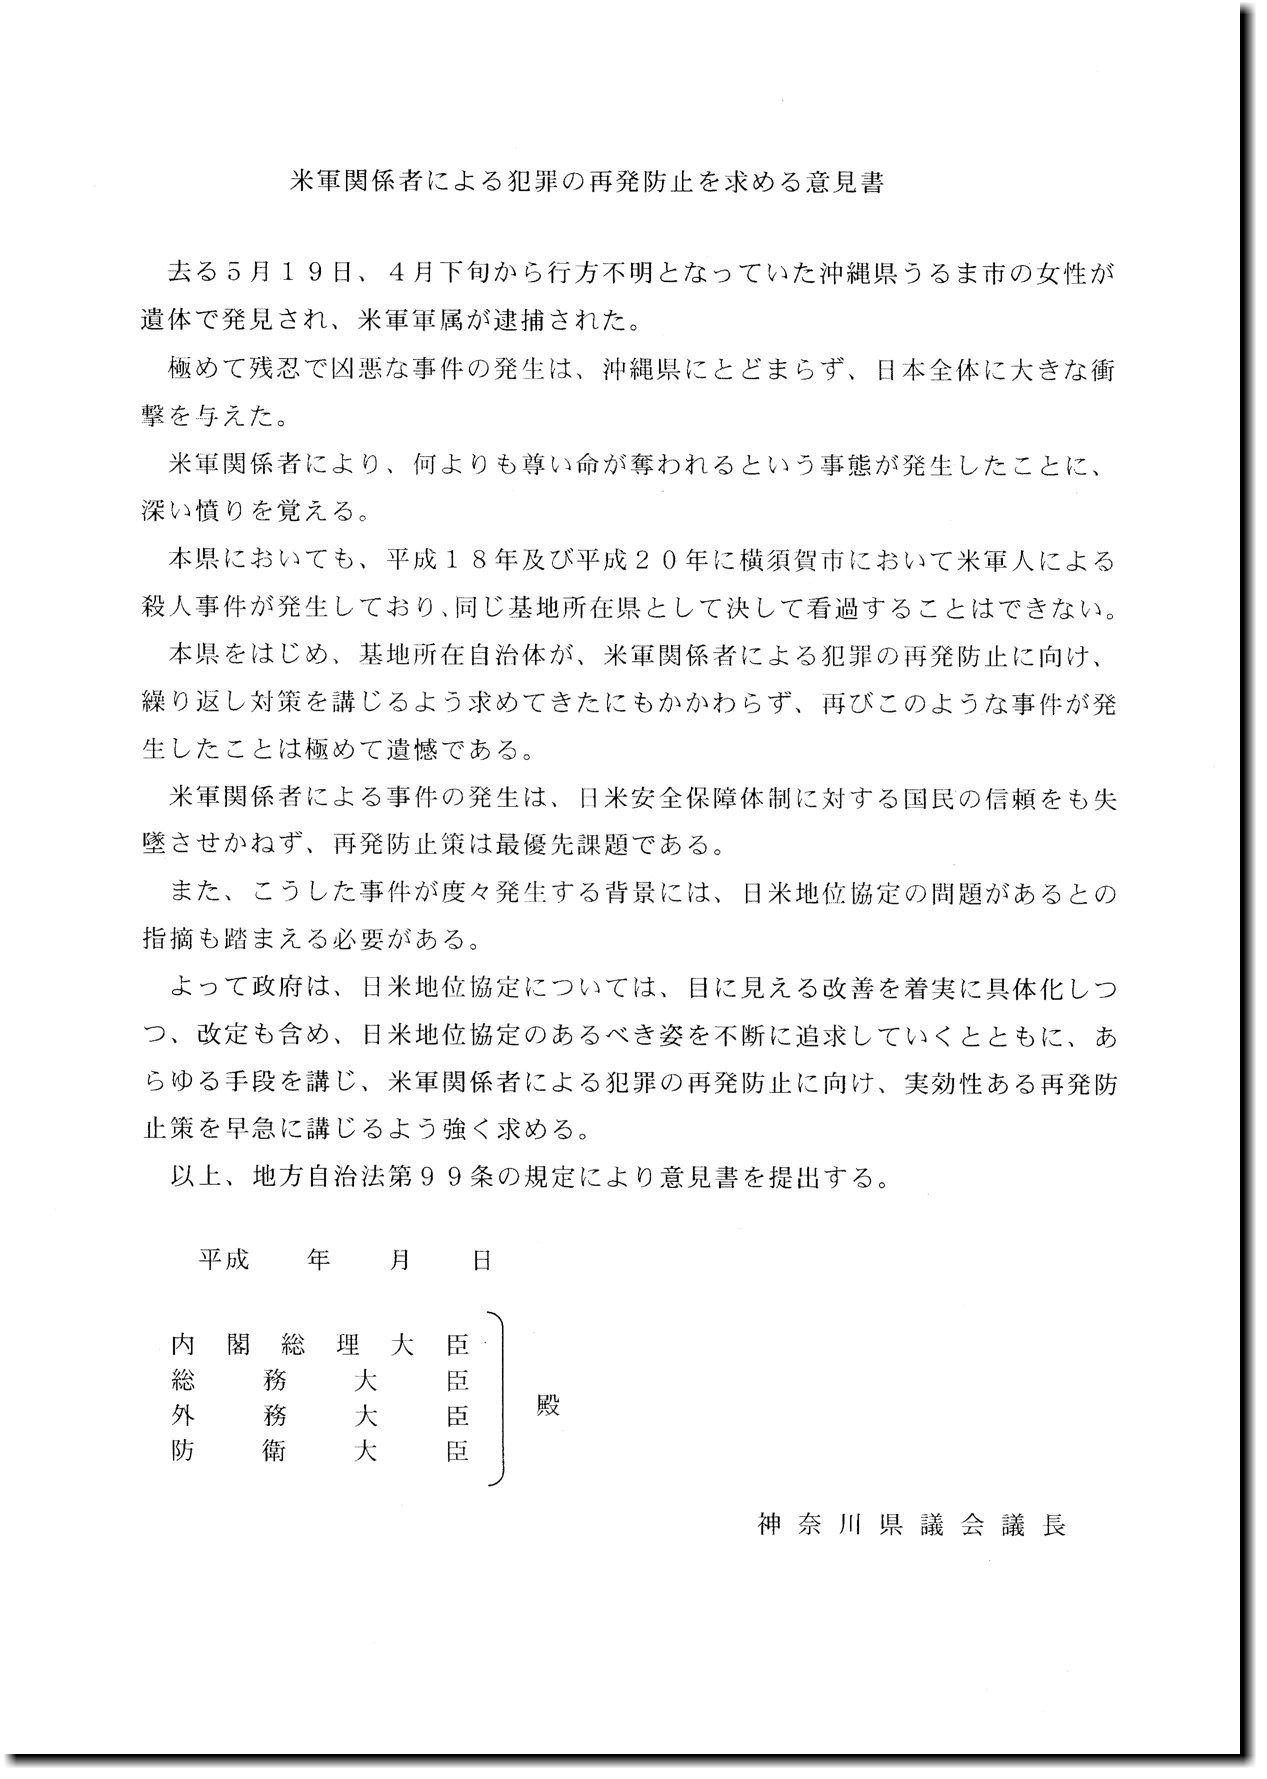 saihatsuboushi-ikensyo-kage